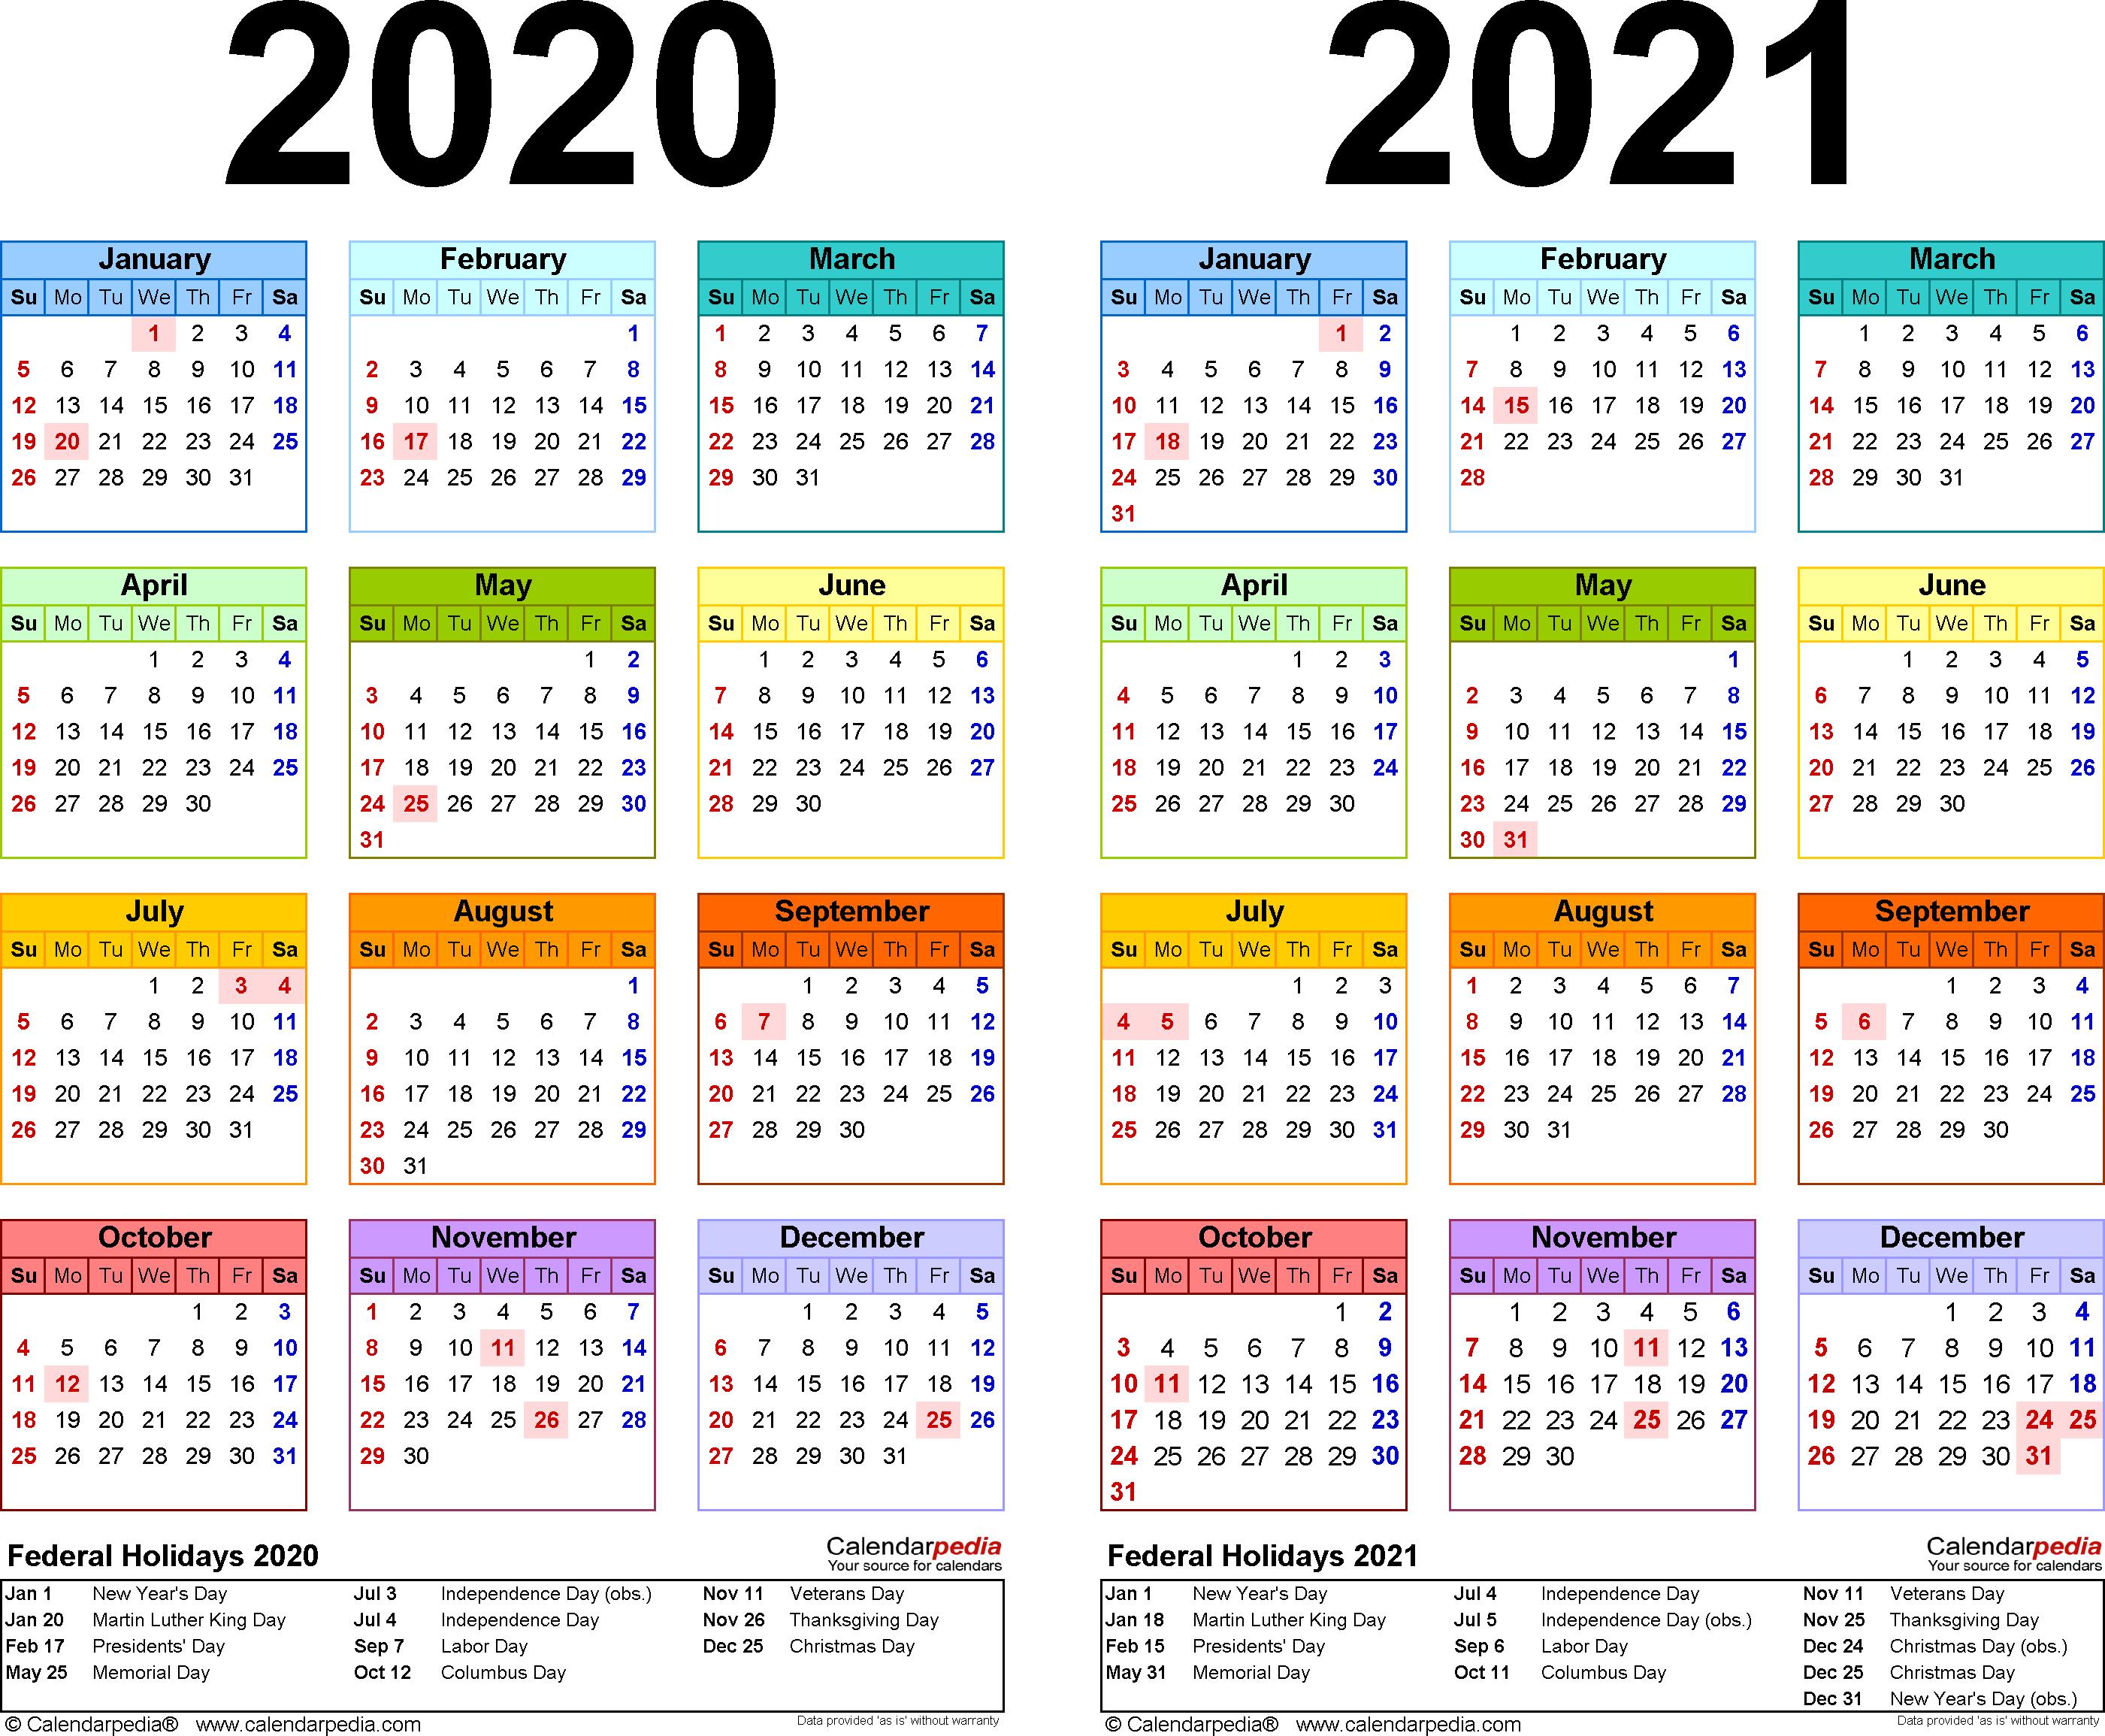 2020-2021 Calendar - Free Printable Two-Year Excel Calendars